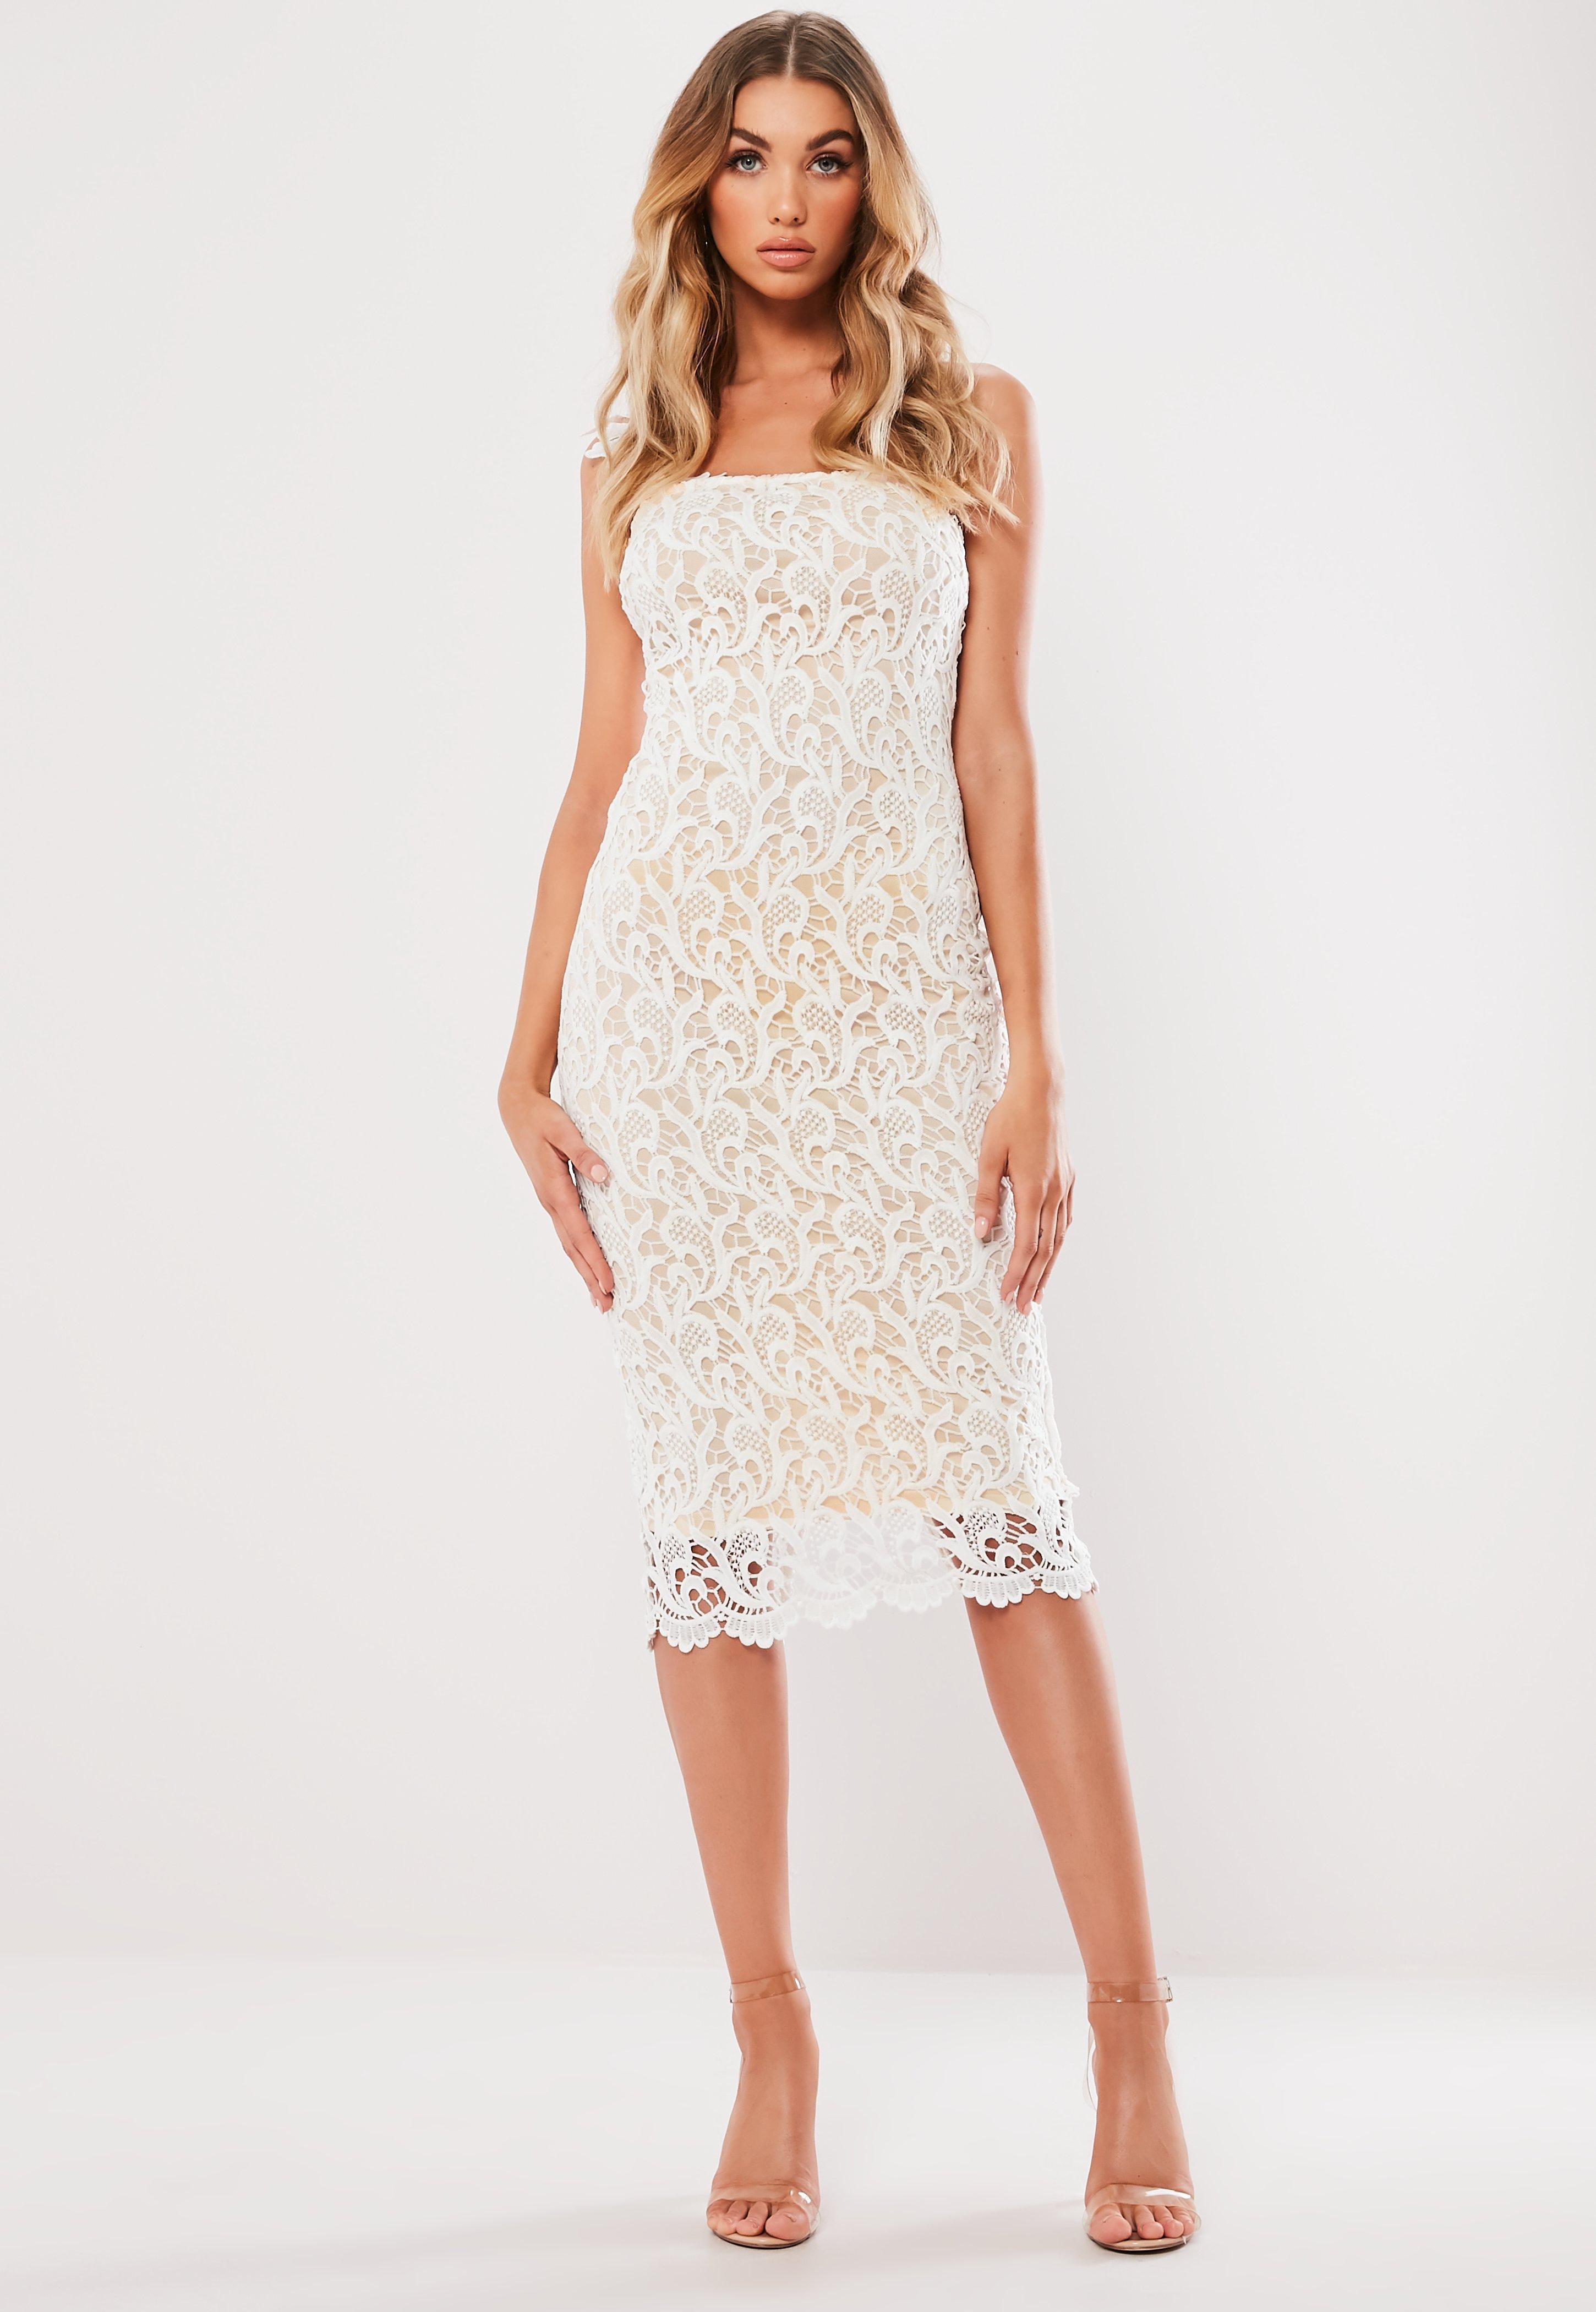 8a6f001f248 Missguided - White One Shoulder Crochet Midi Dress - Lyst. View fullscreen